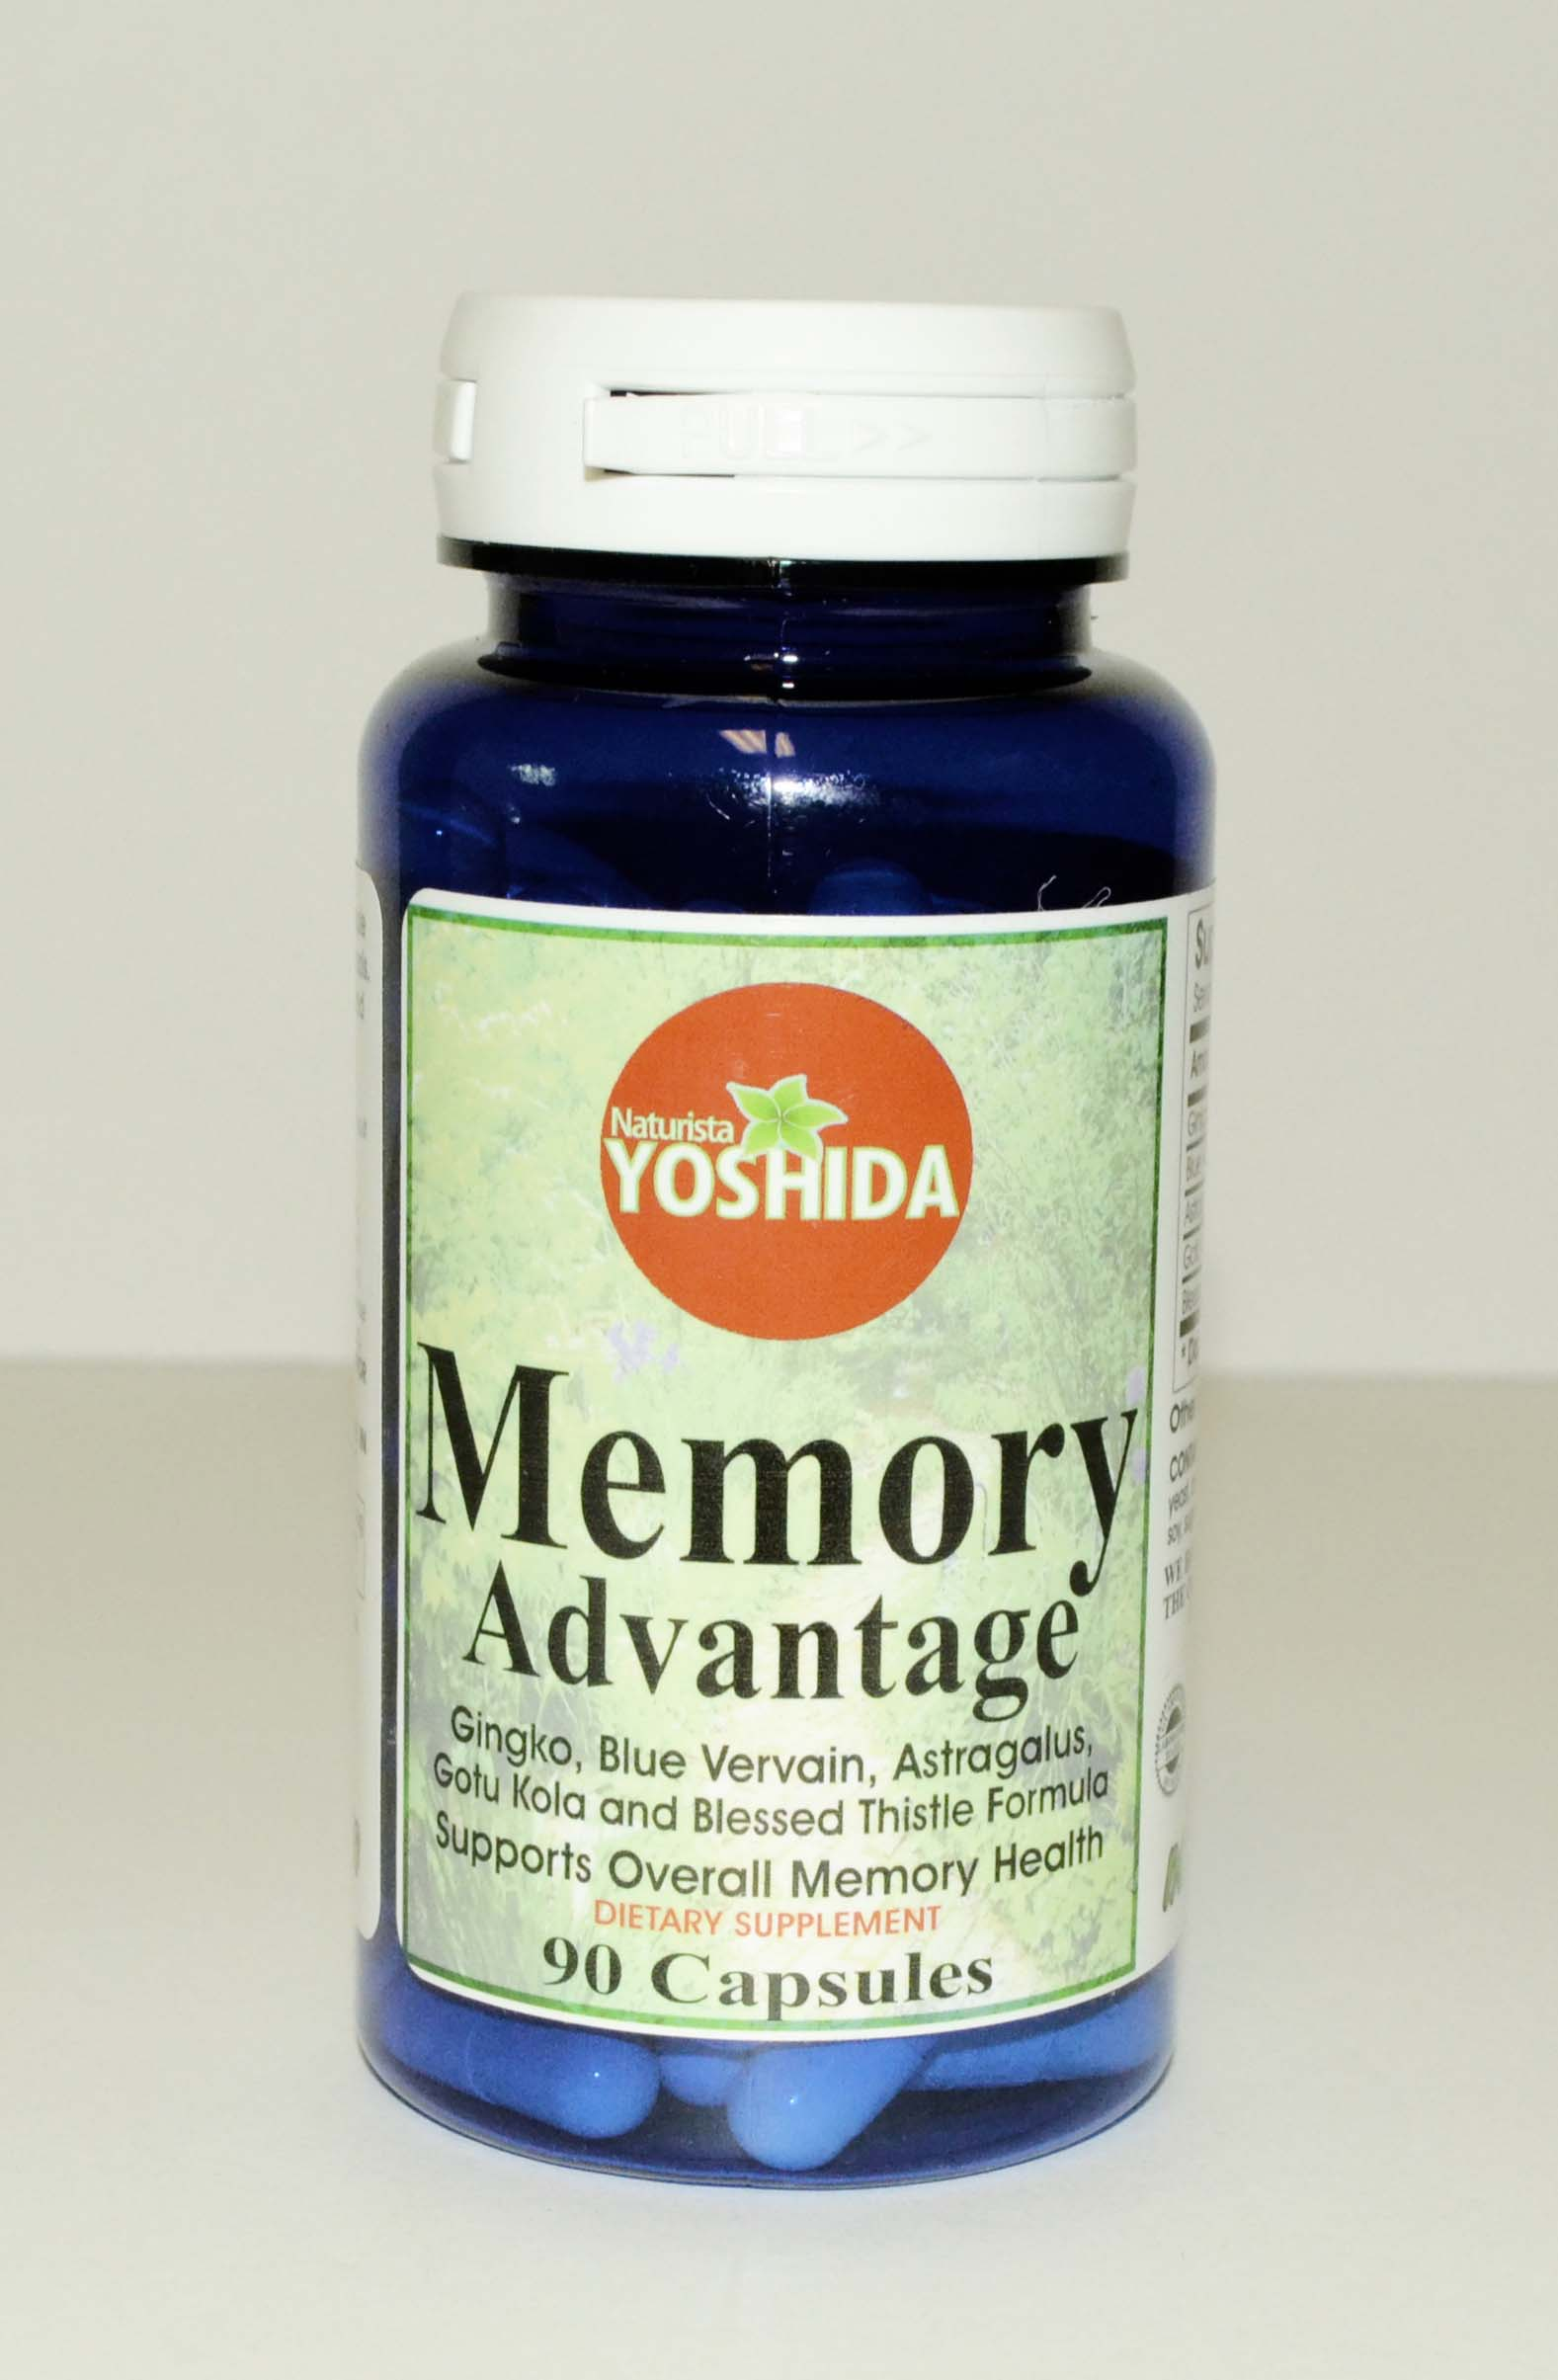 Memory Advantage